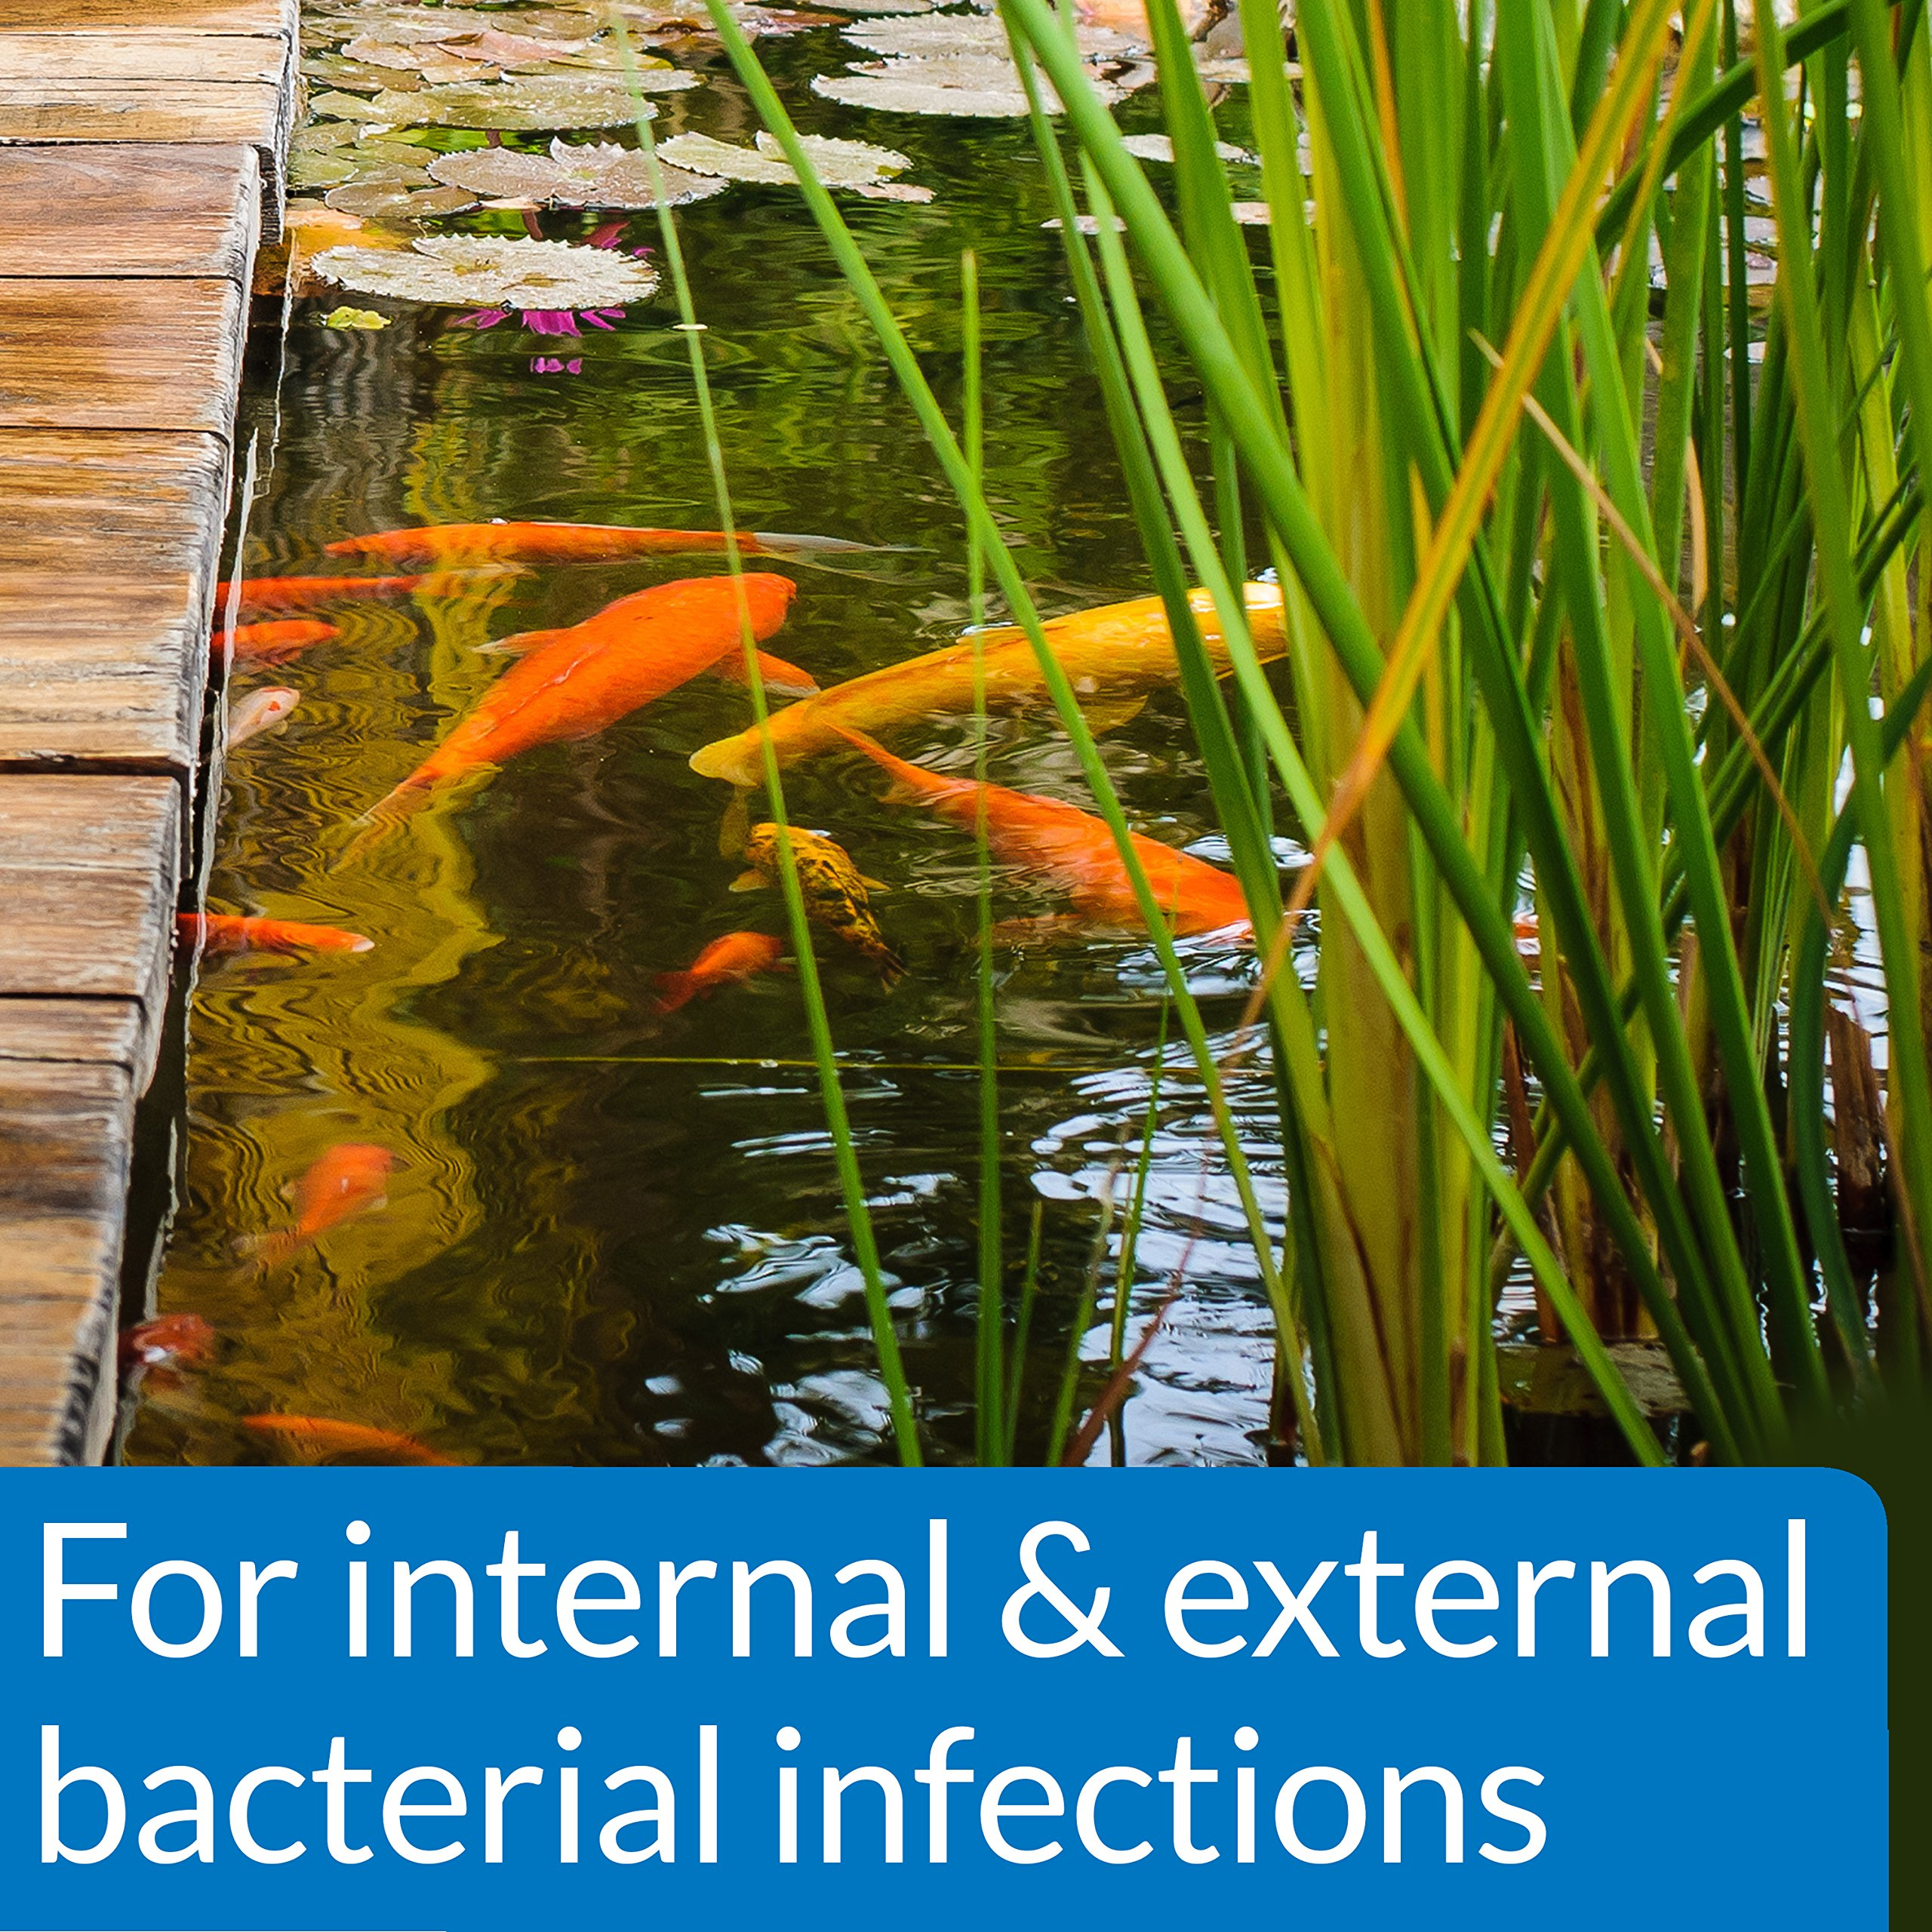 API POND PIMAFIX Antifungal Pond Fish Infection Remedy 64-Ounce Bottle by API (Image #3)